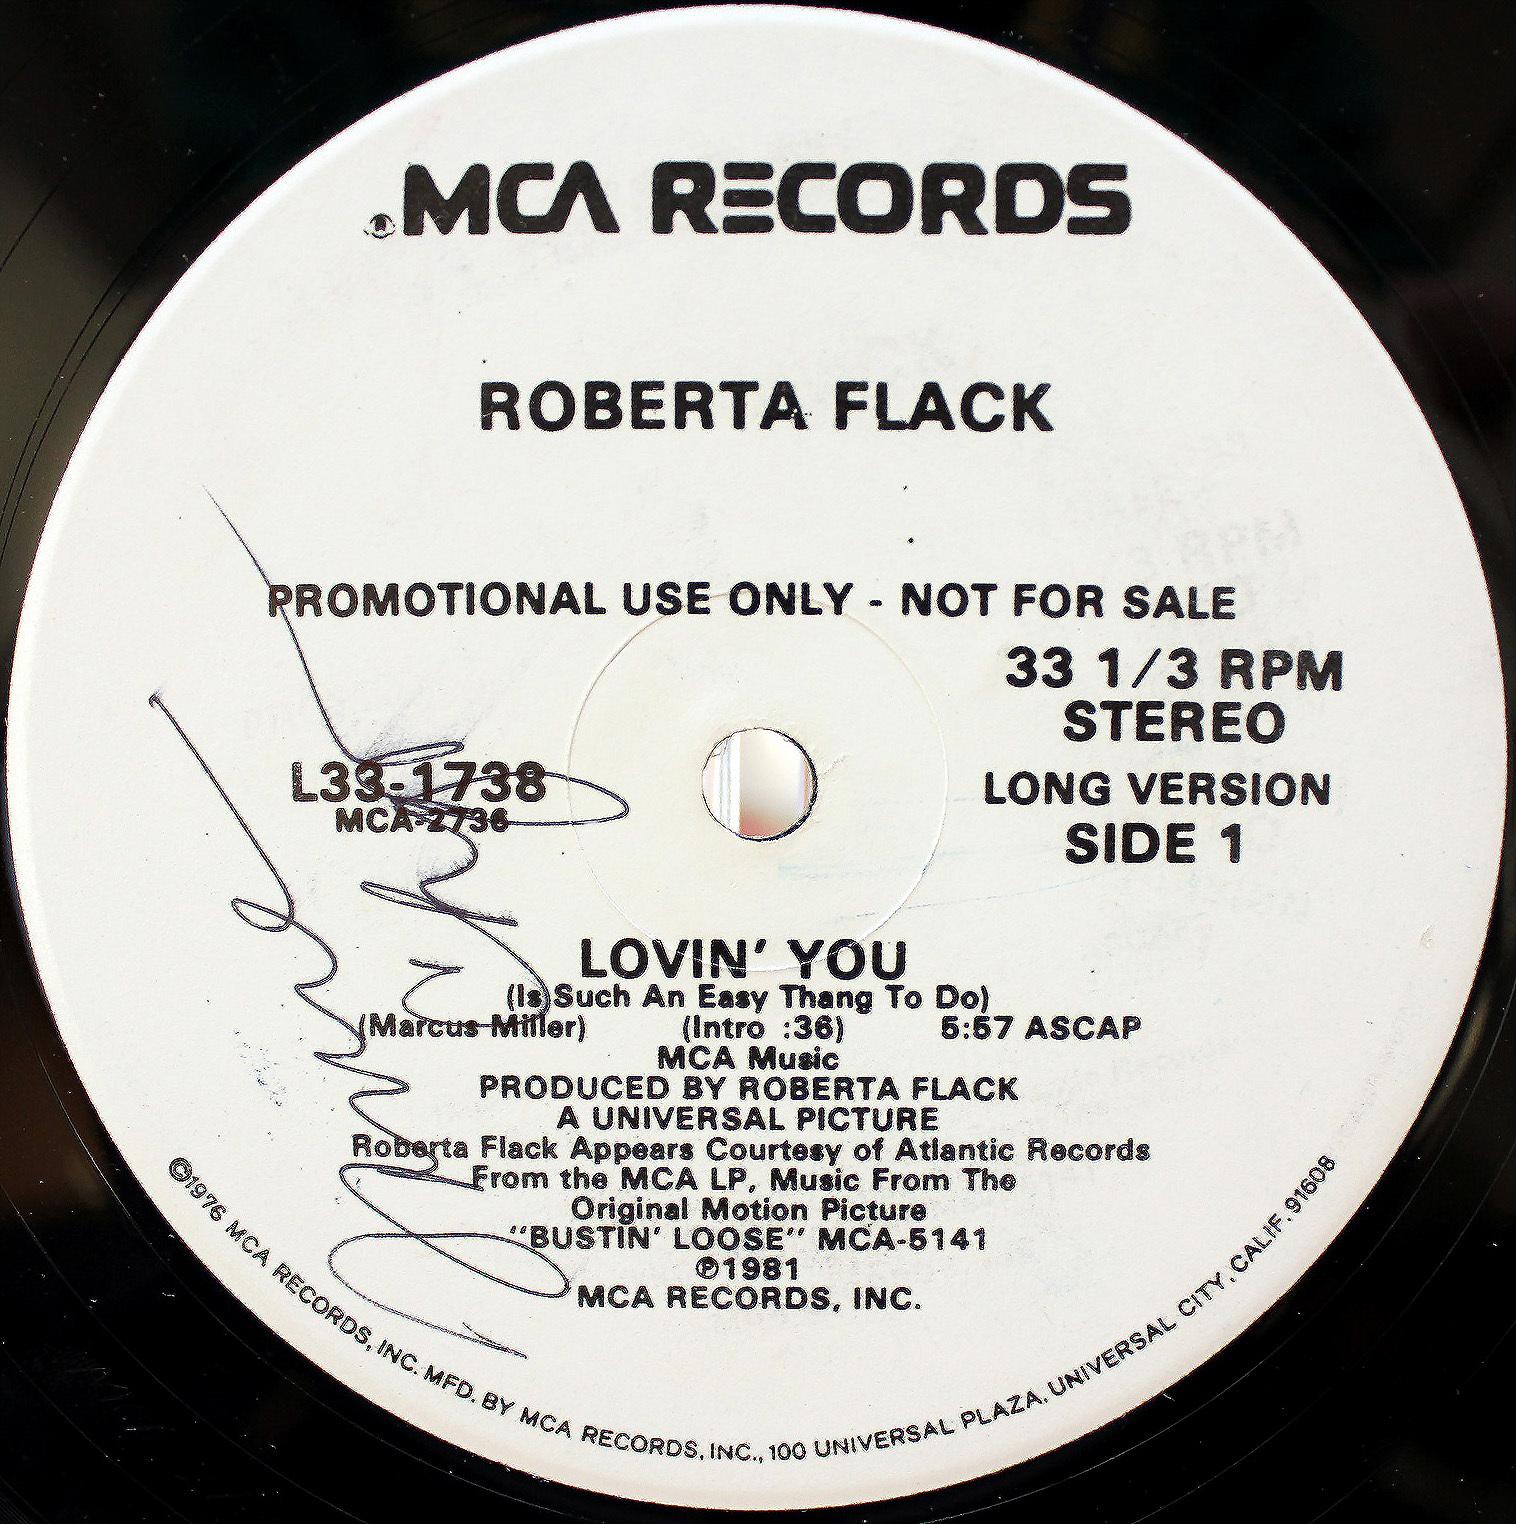 Roberta Flack loving you 03